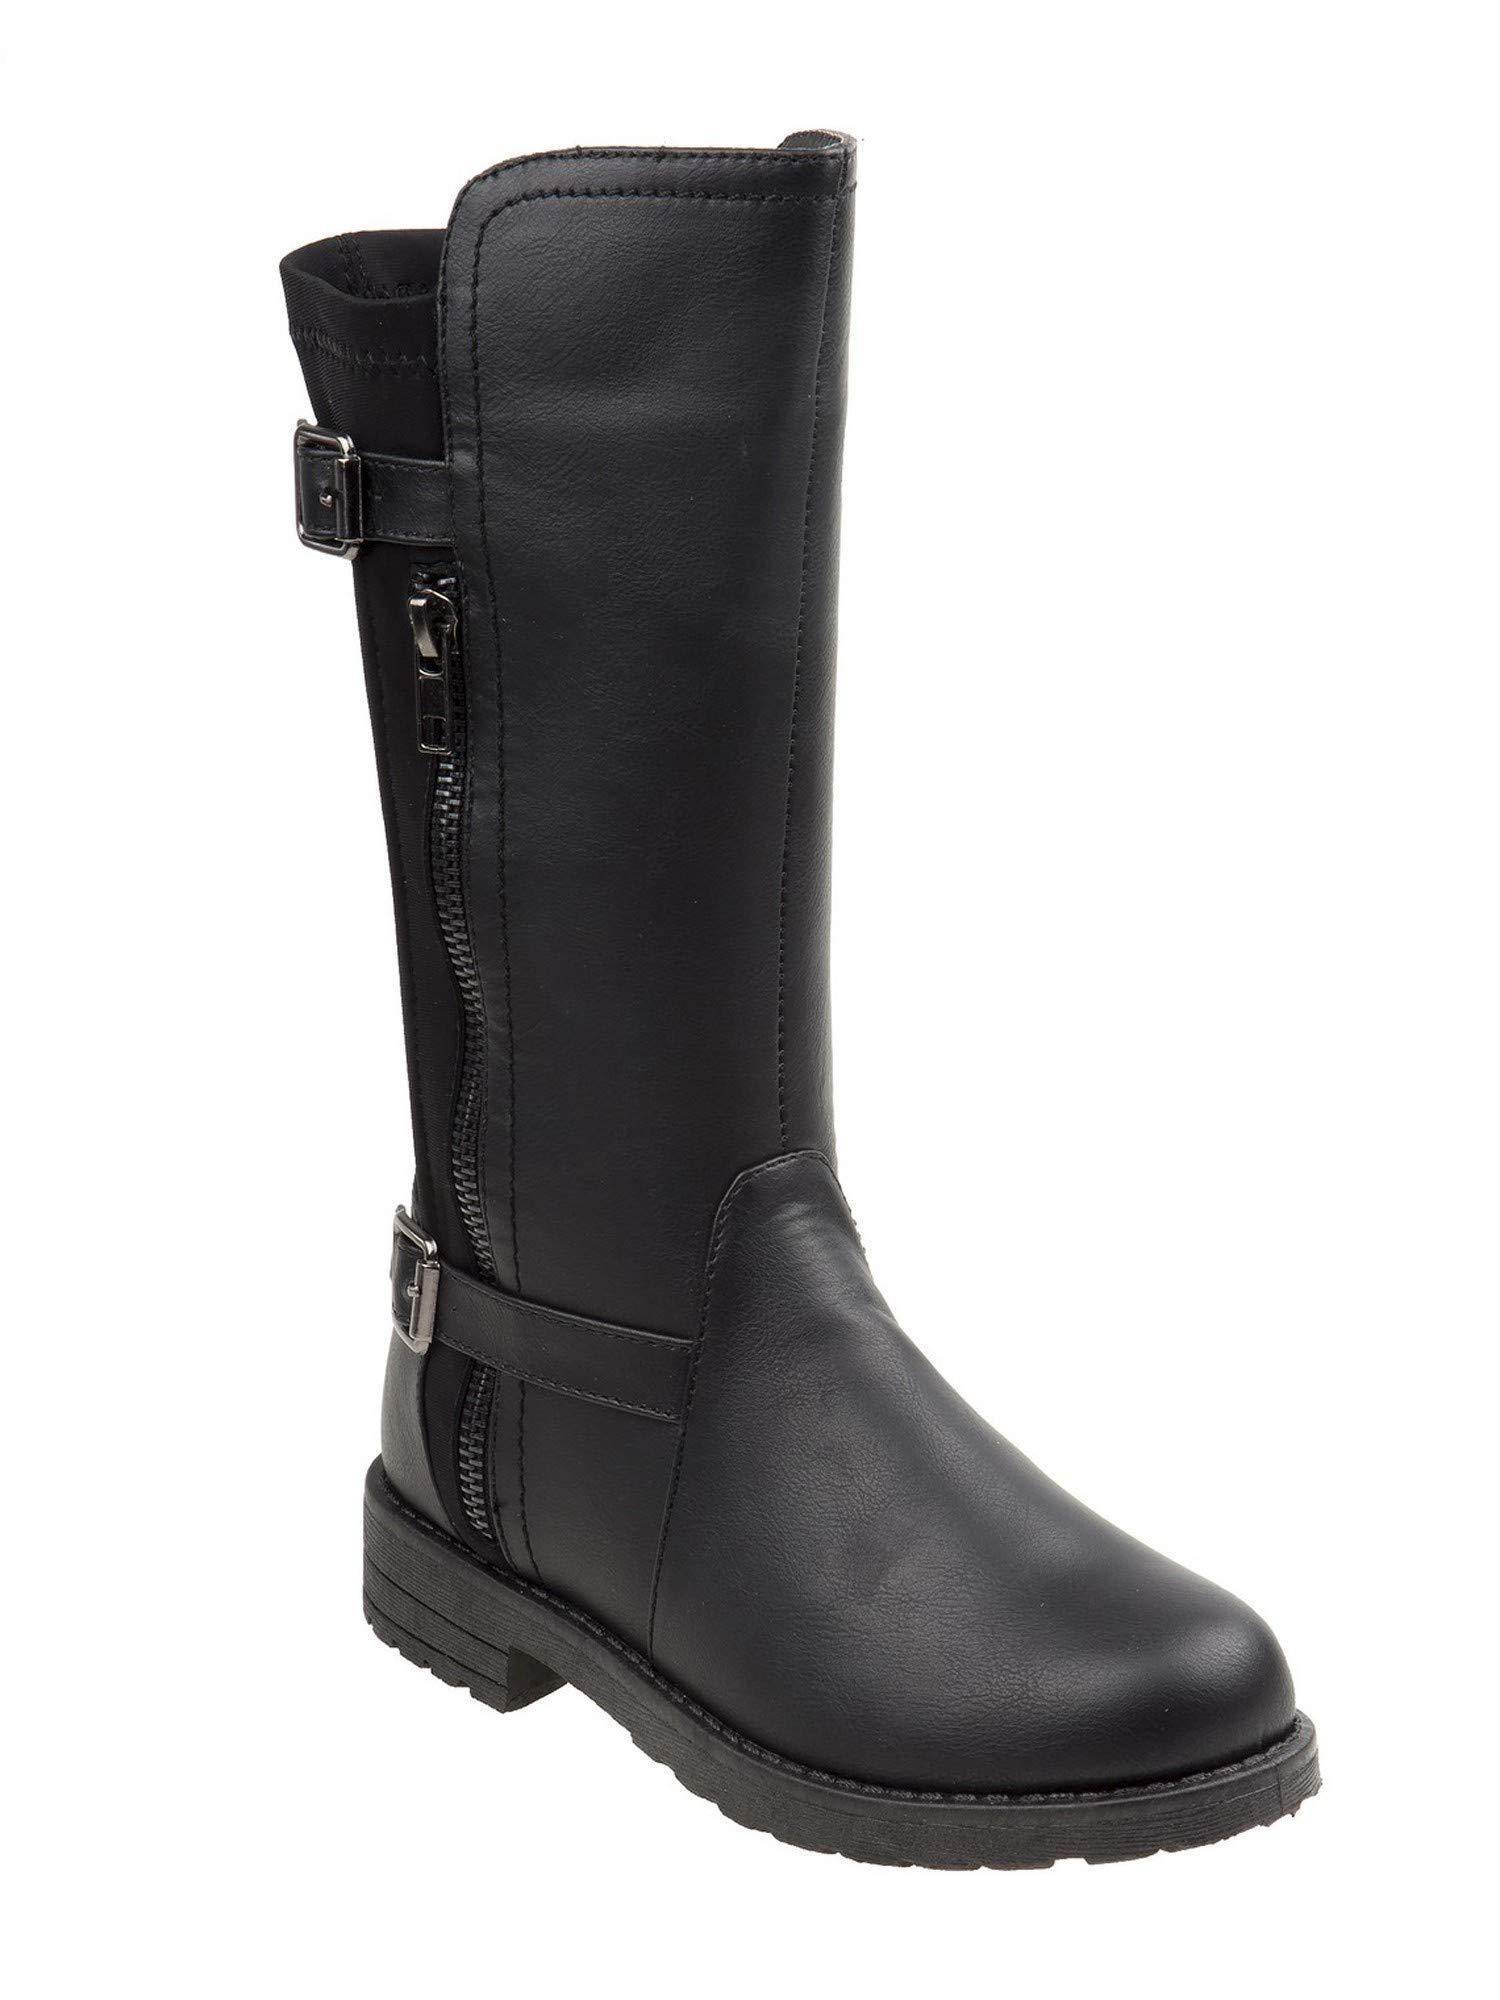 Kensie Girls Black Hi-Low Collar Buckle Strap Side Zip Tall Boots 13 Kids